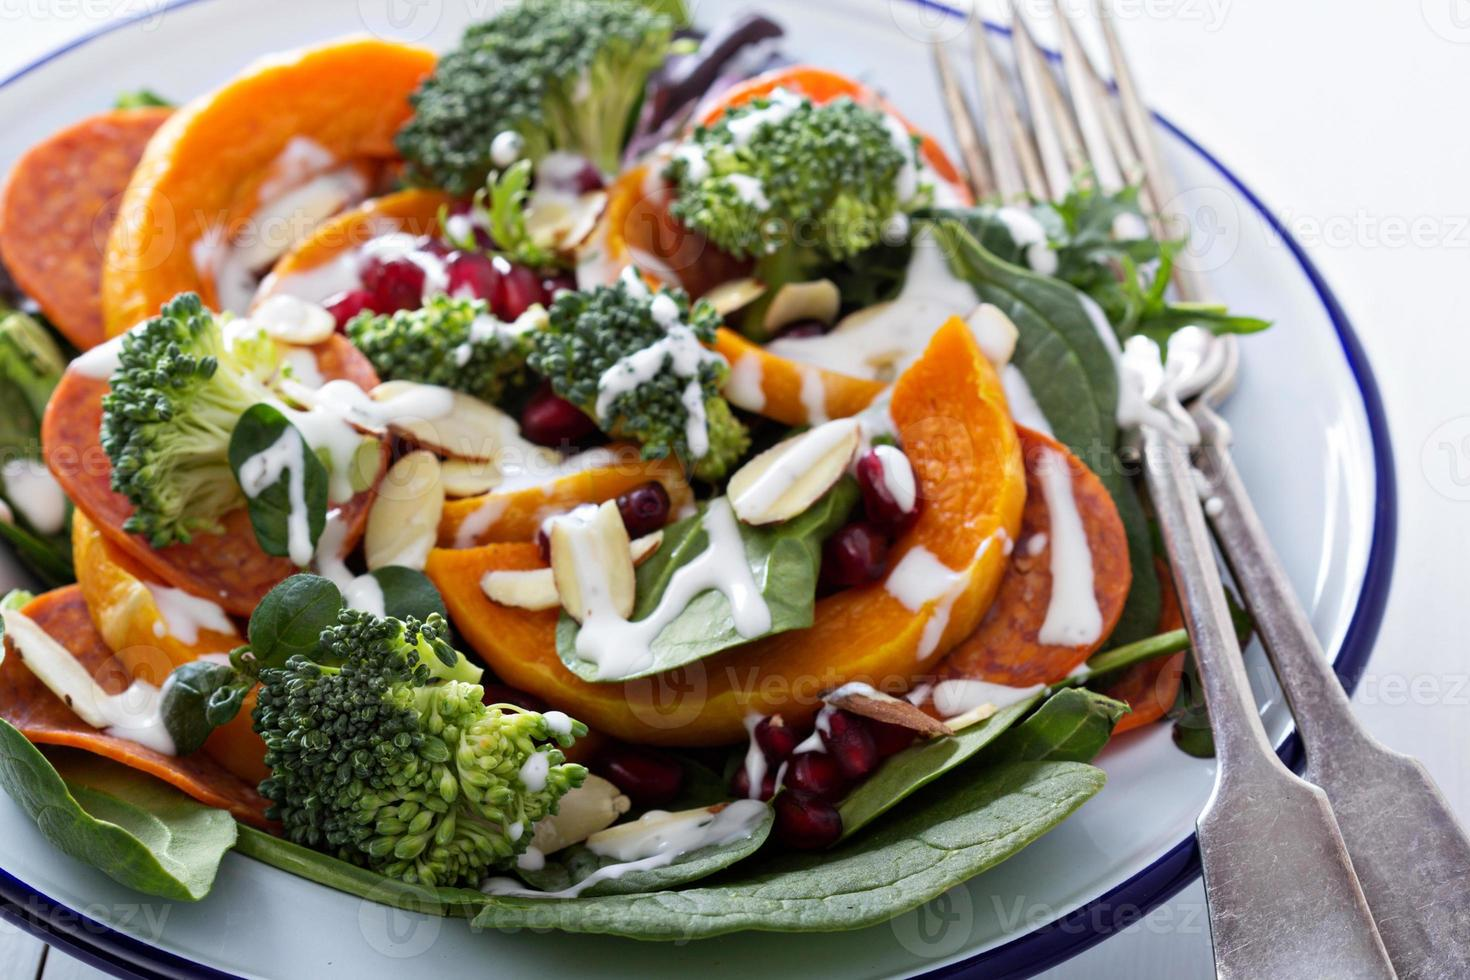 salade de légumes, pepperoni et grenade photo